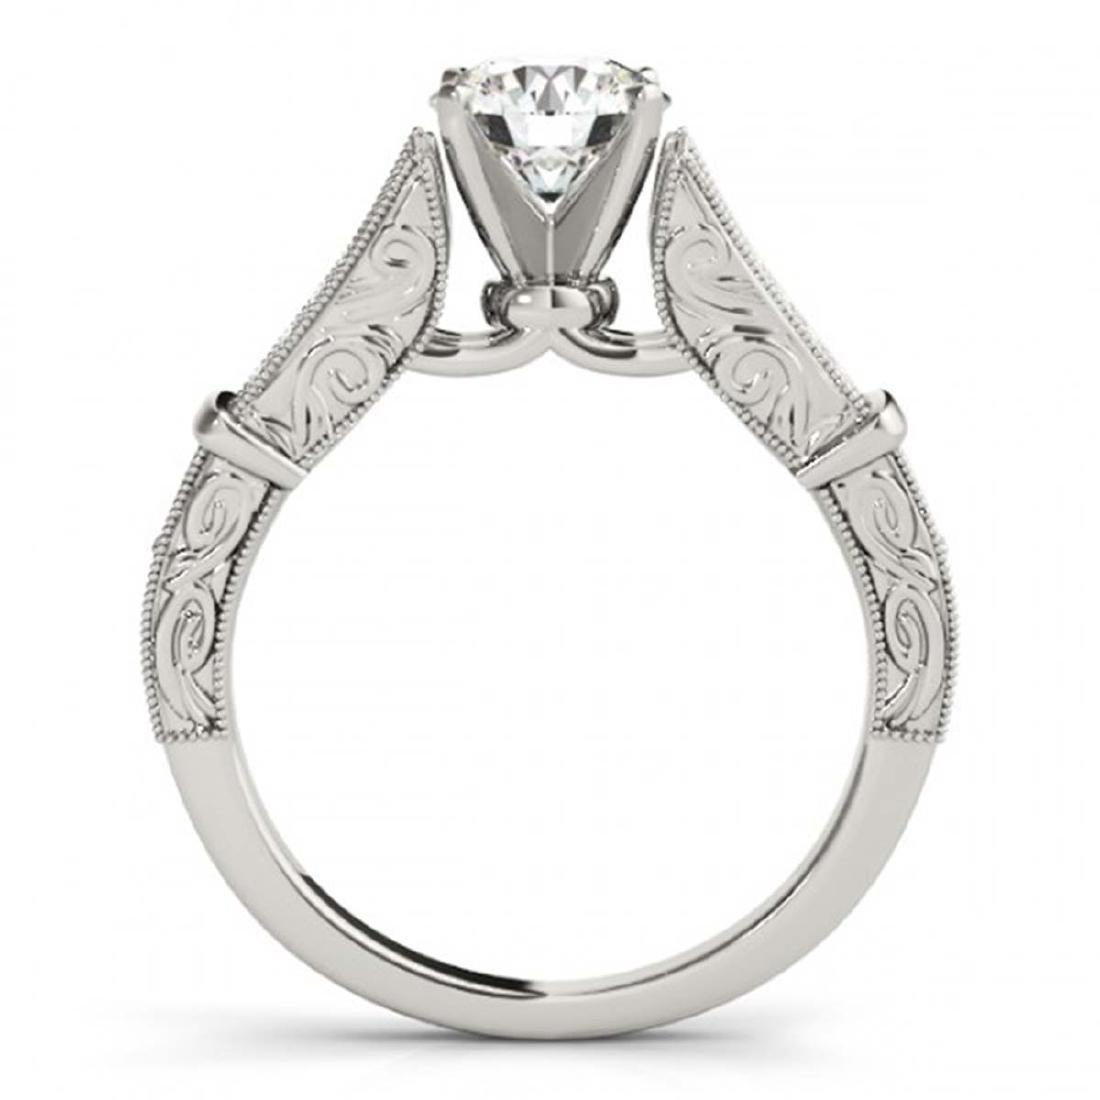 0.75 ctw VS/SI Diamond Ring 18K White Gold - REF-113M2F - 2